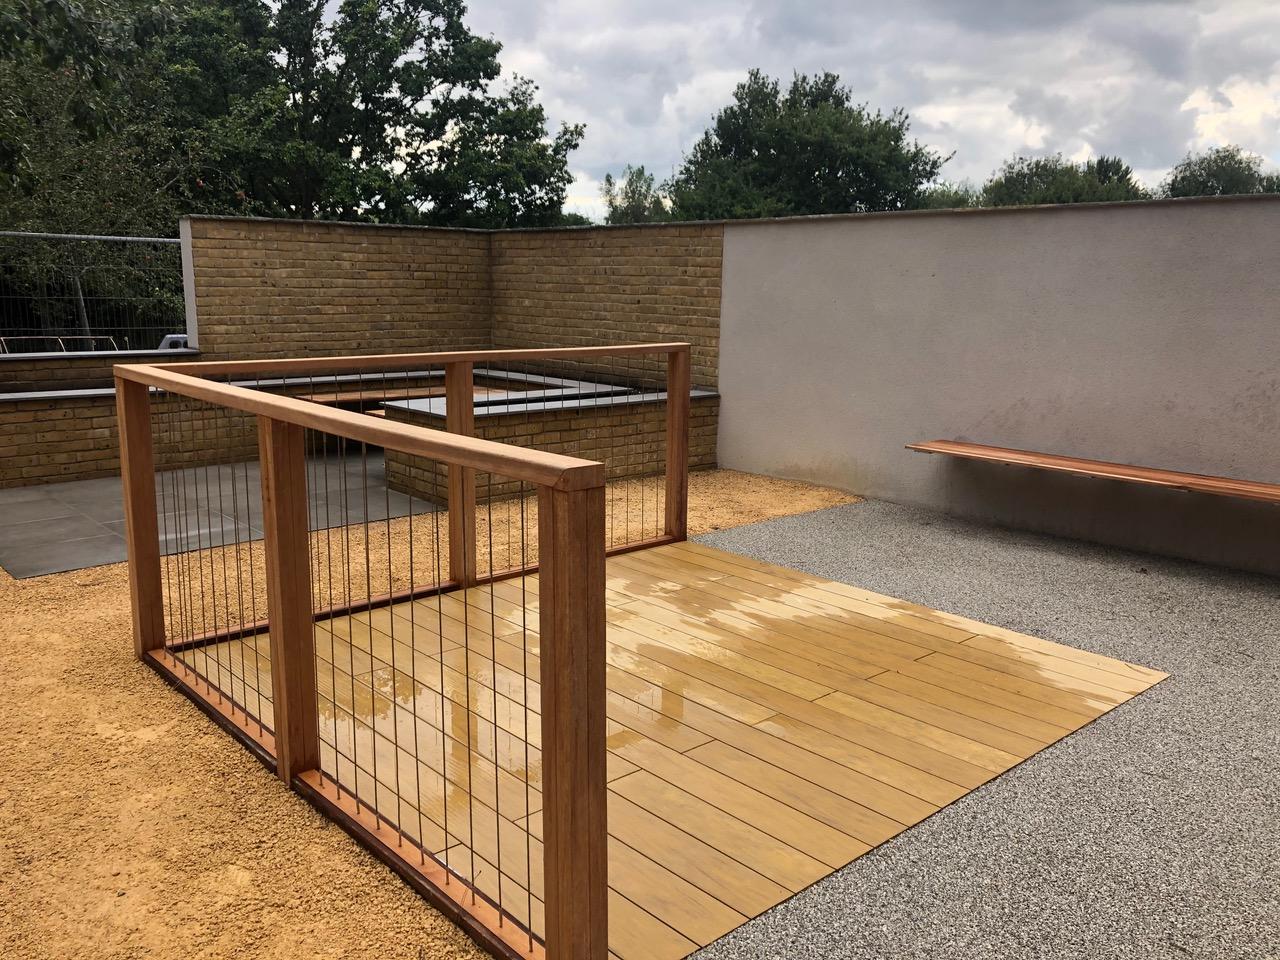 Urban Garden build is completed